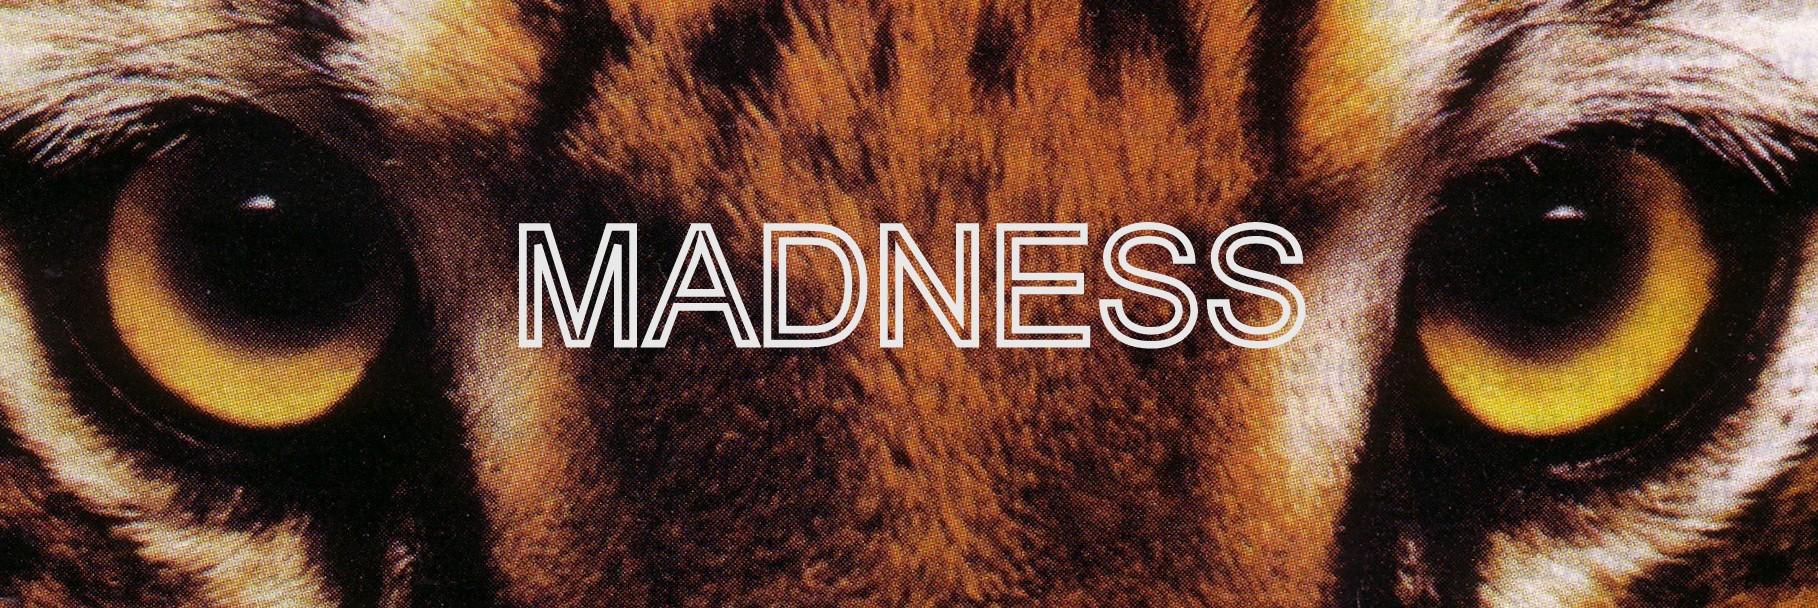 Madness-